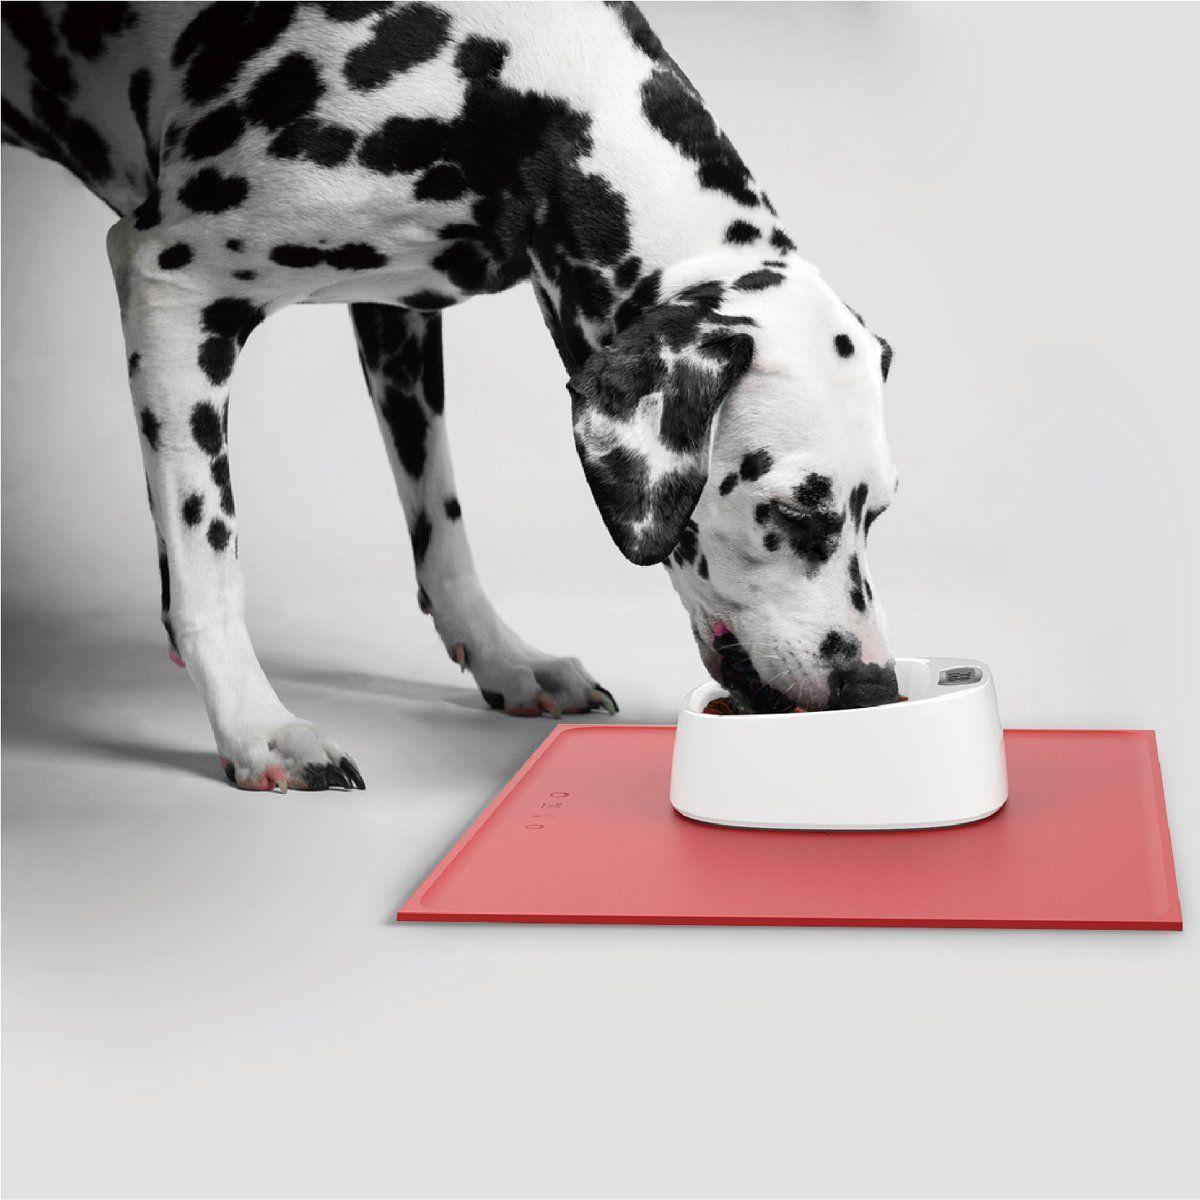 Petkit Dog Feeding Mat Waterproof Pet Food Mat Fda Grade Silicone